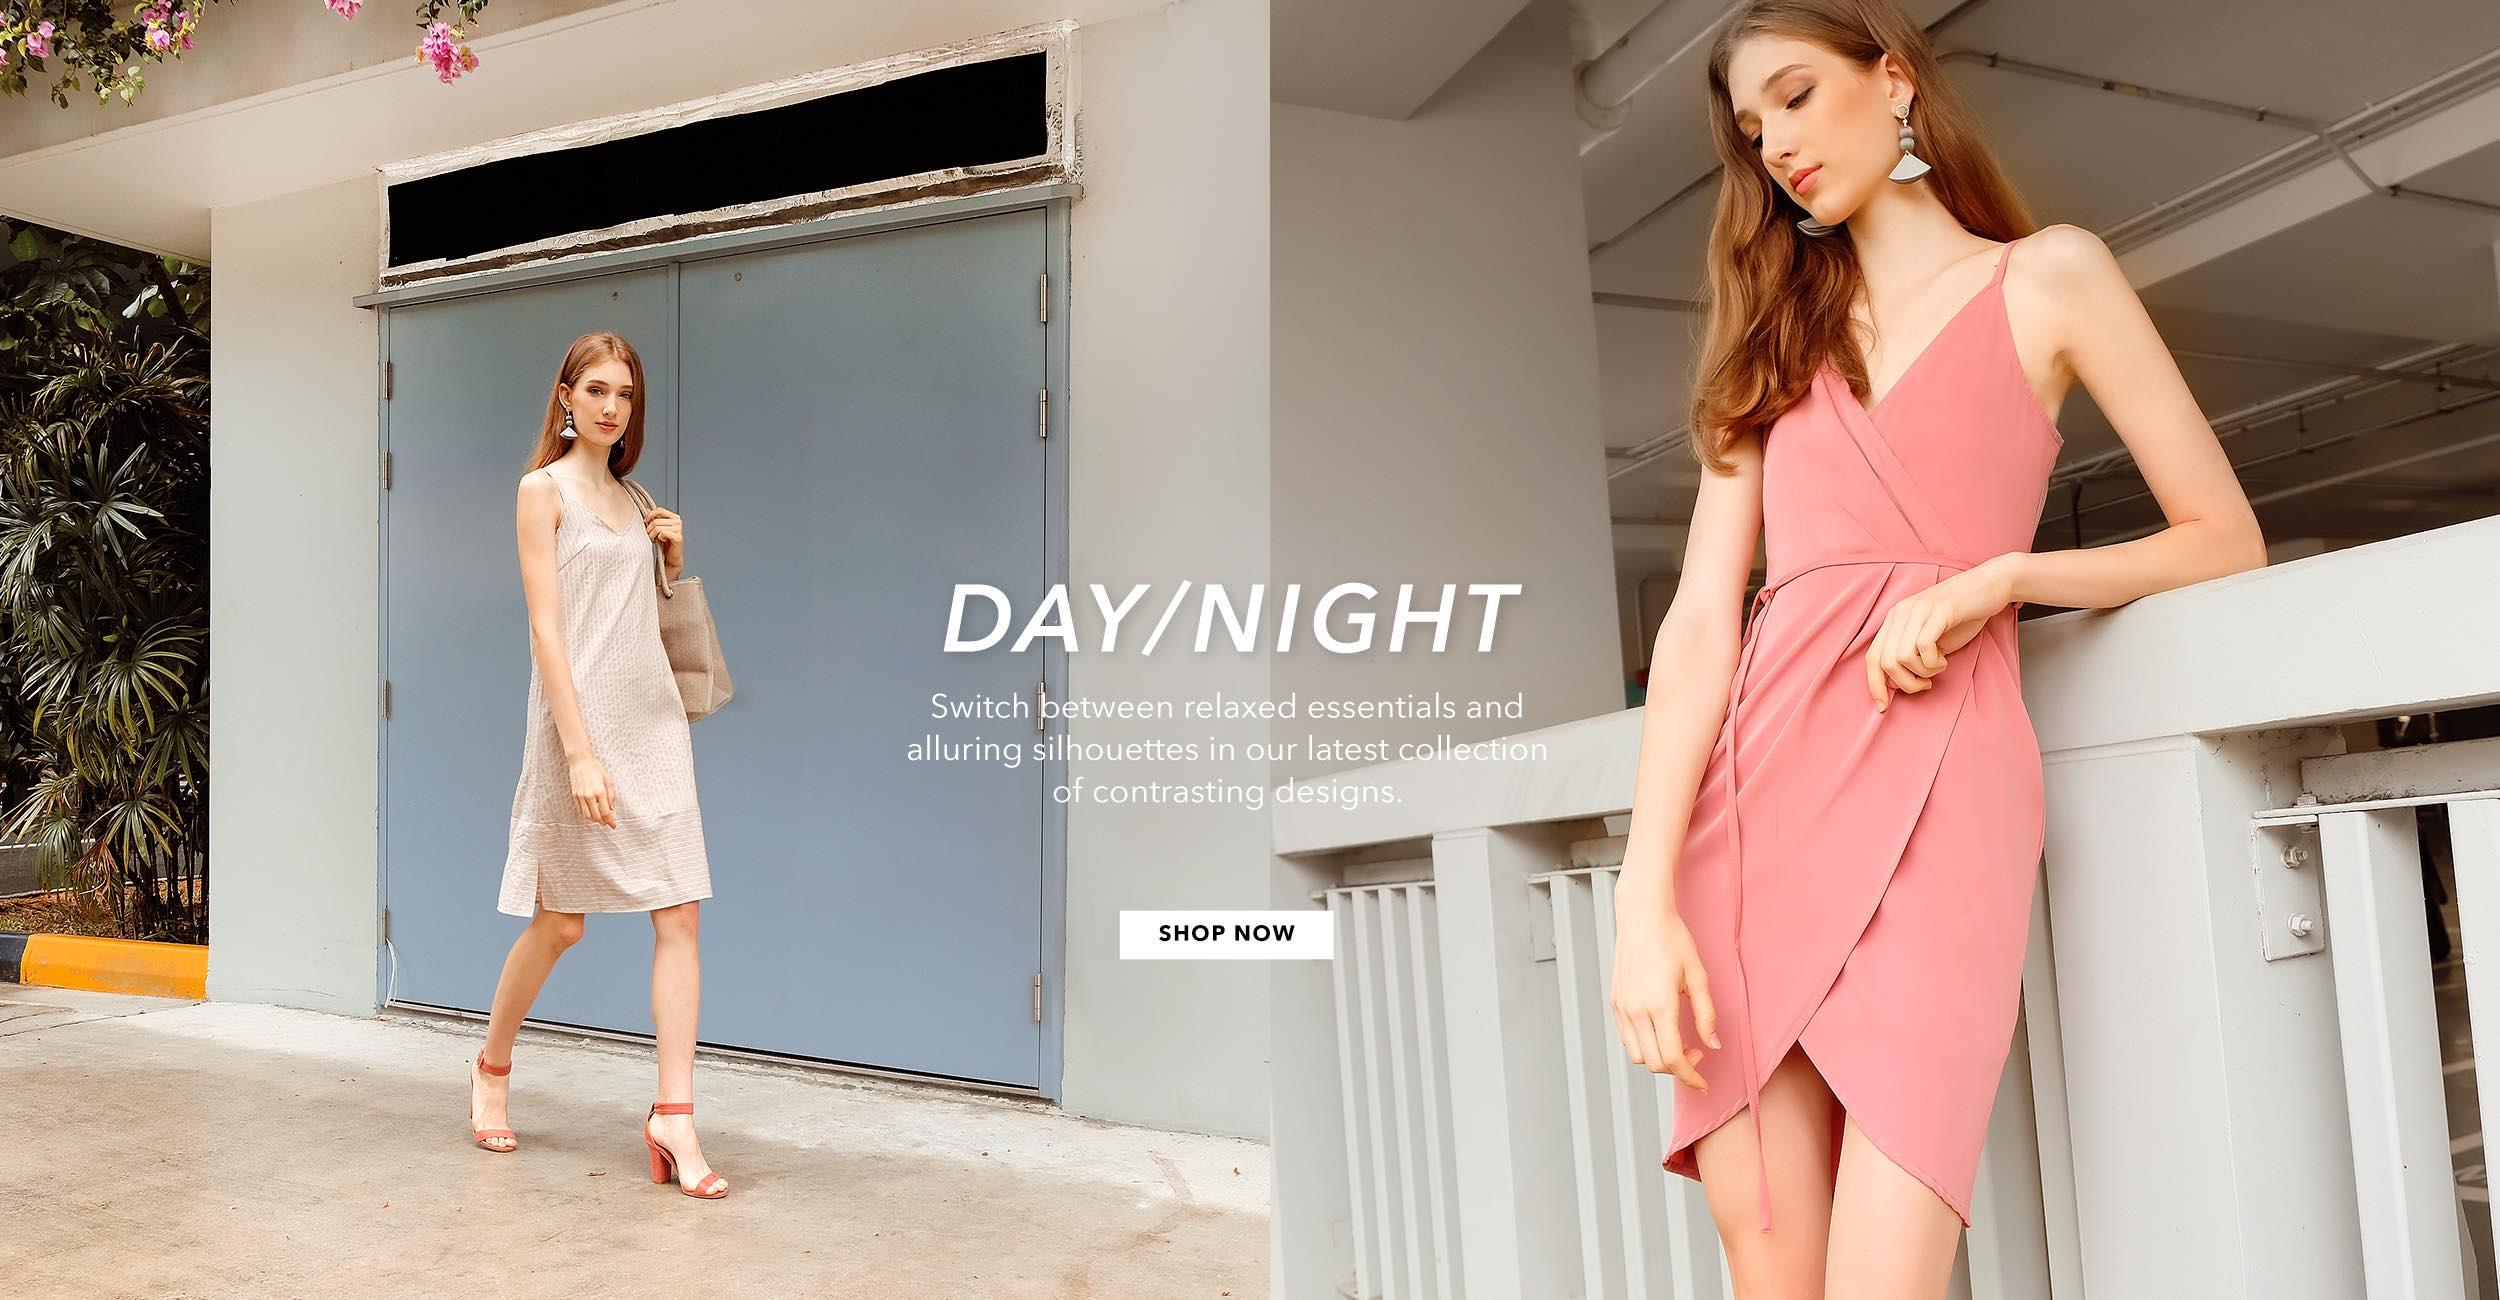 Day / Night